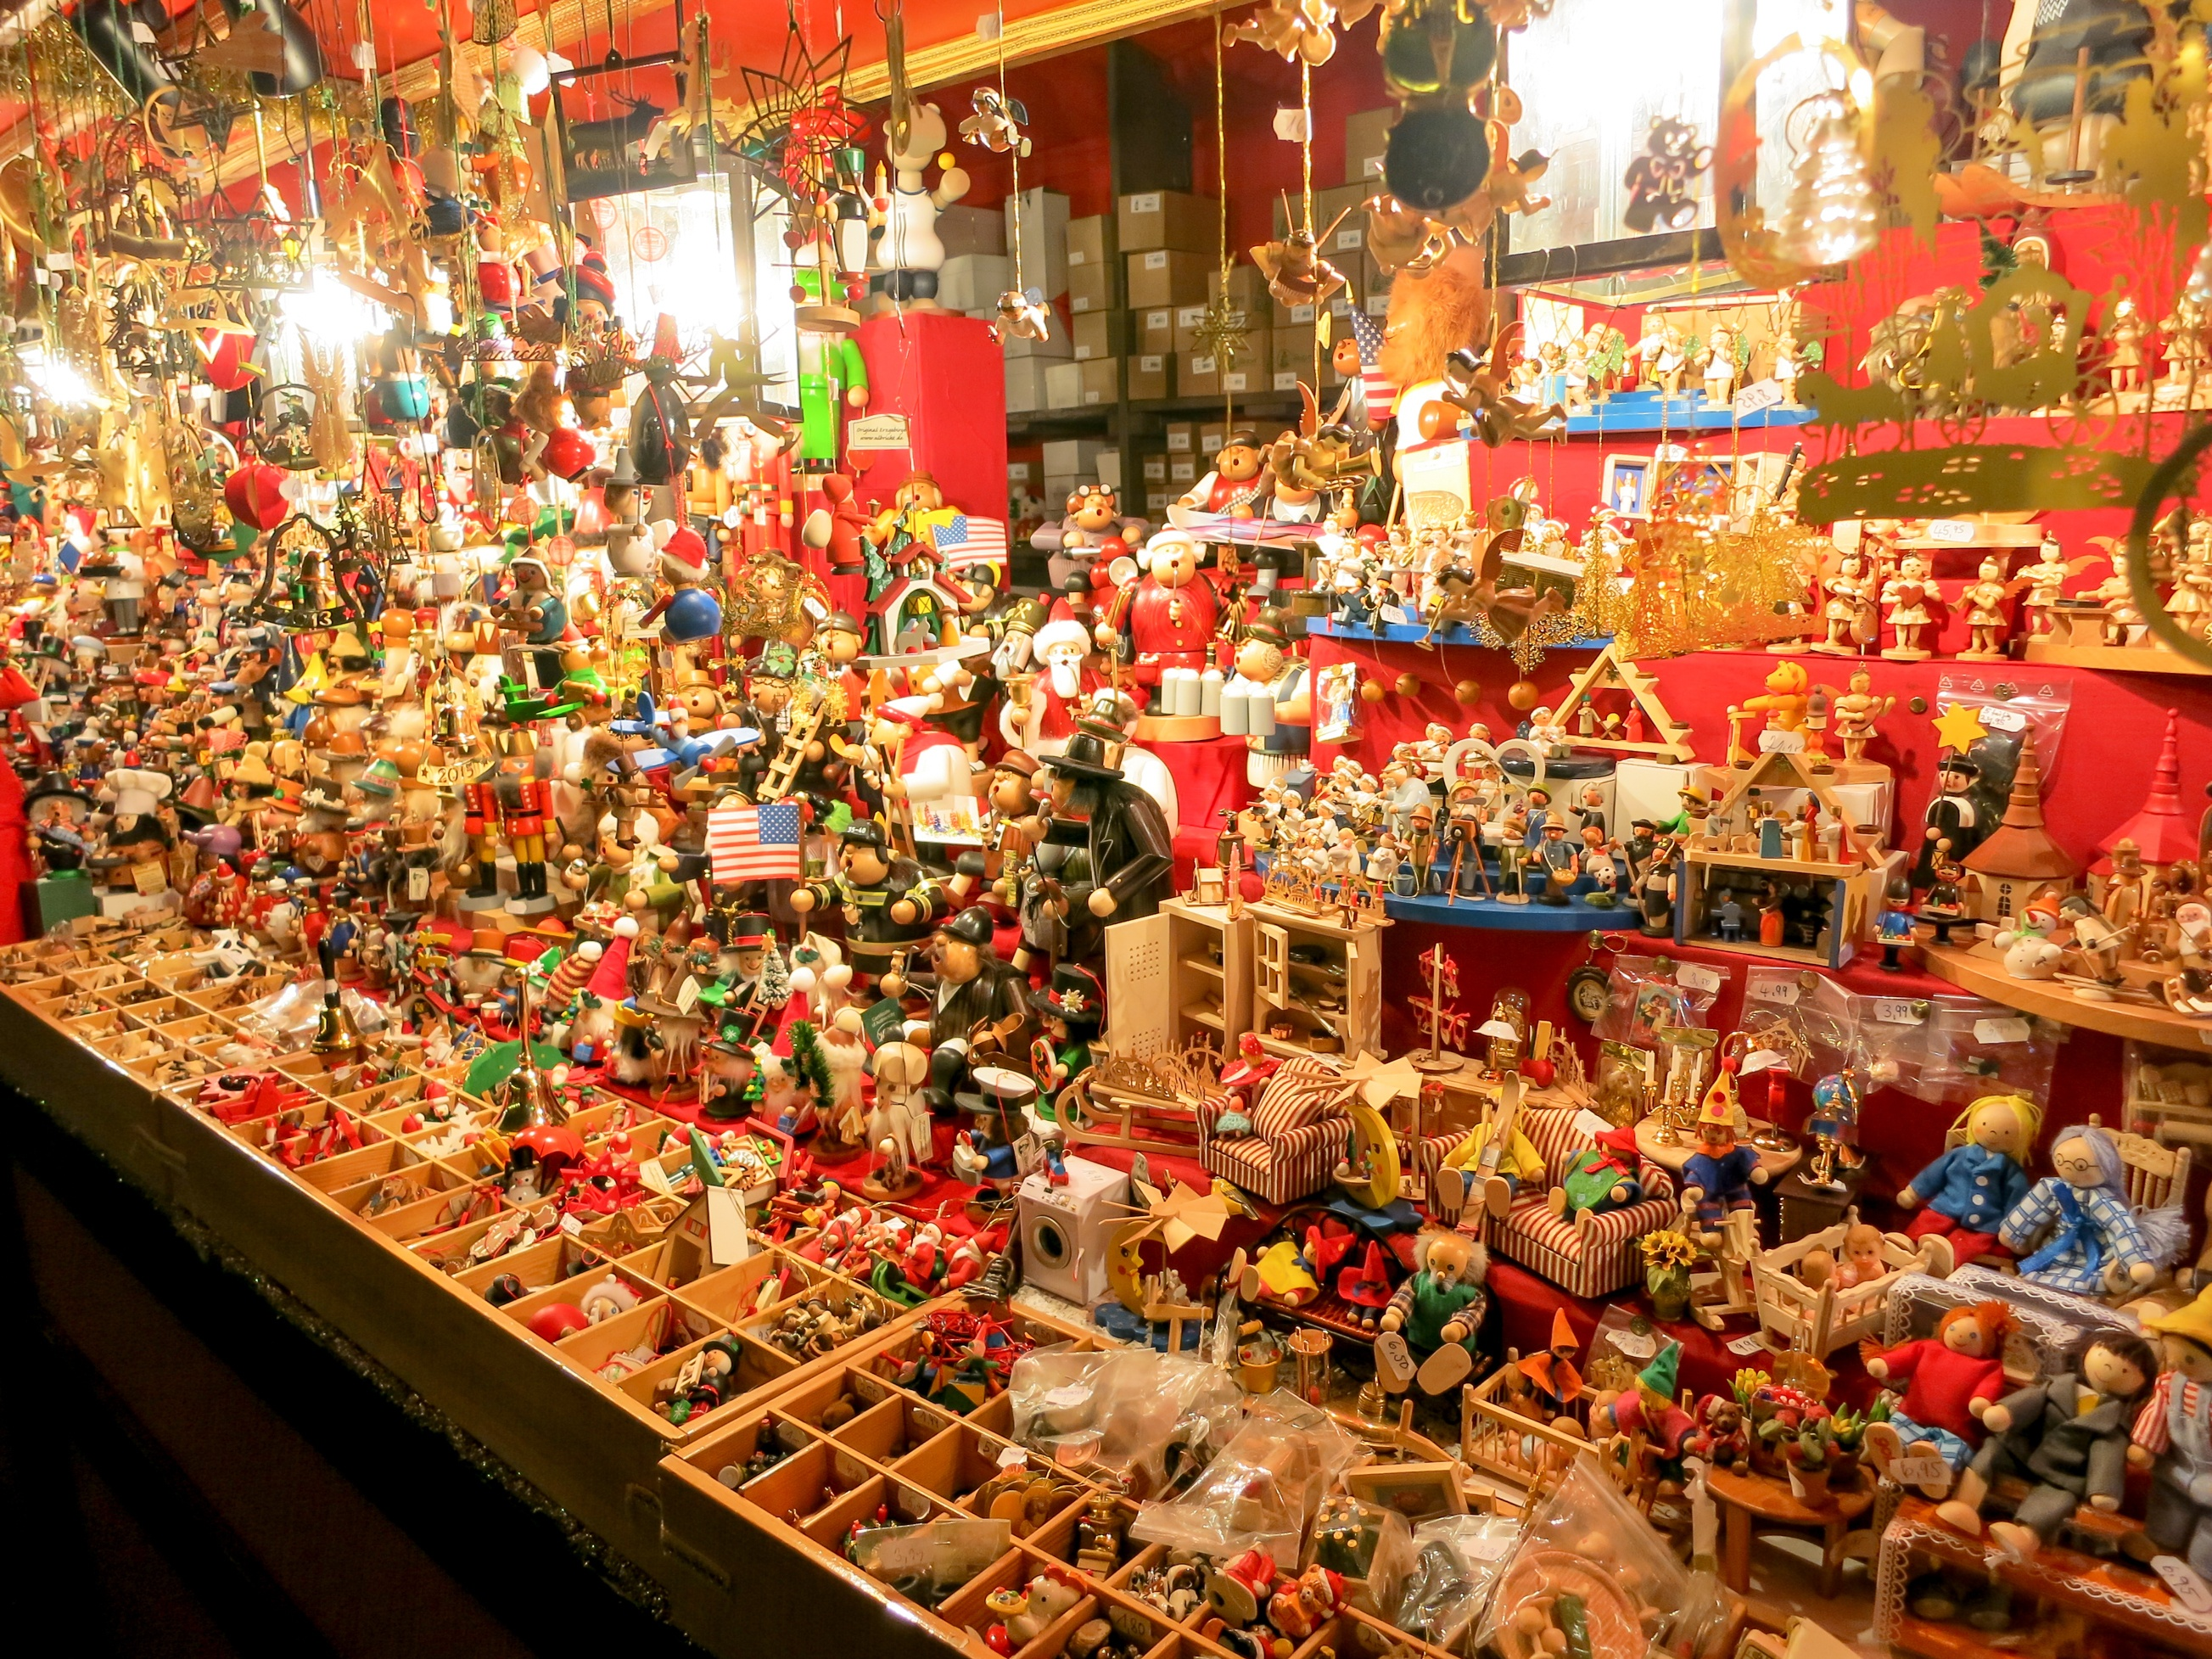 Germany_ChristmasMarkets_Sights_shutterstock_523664338-1